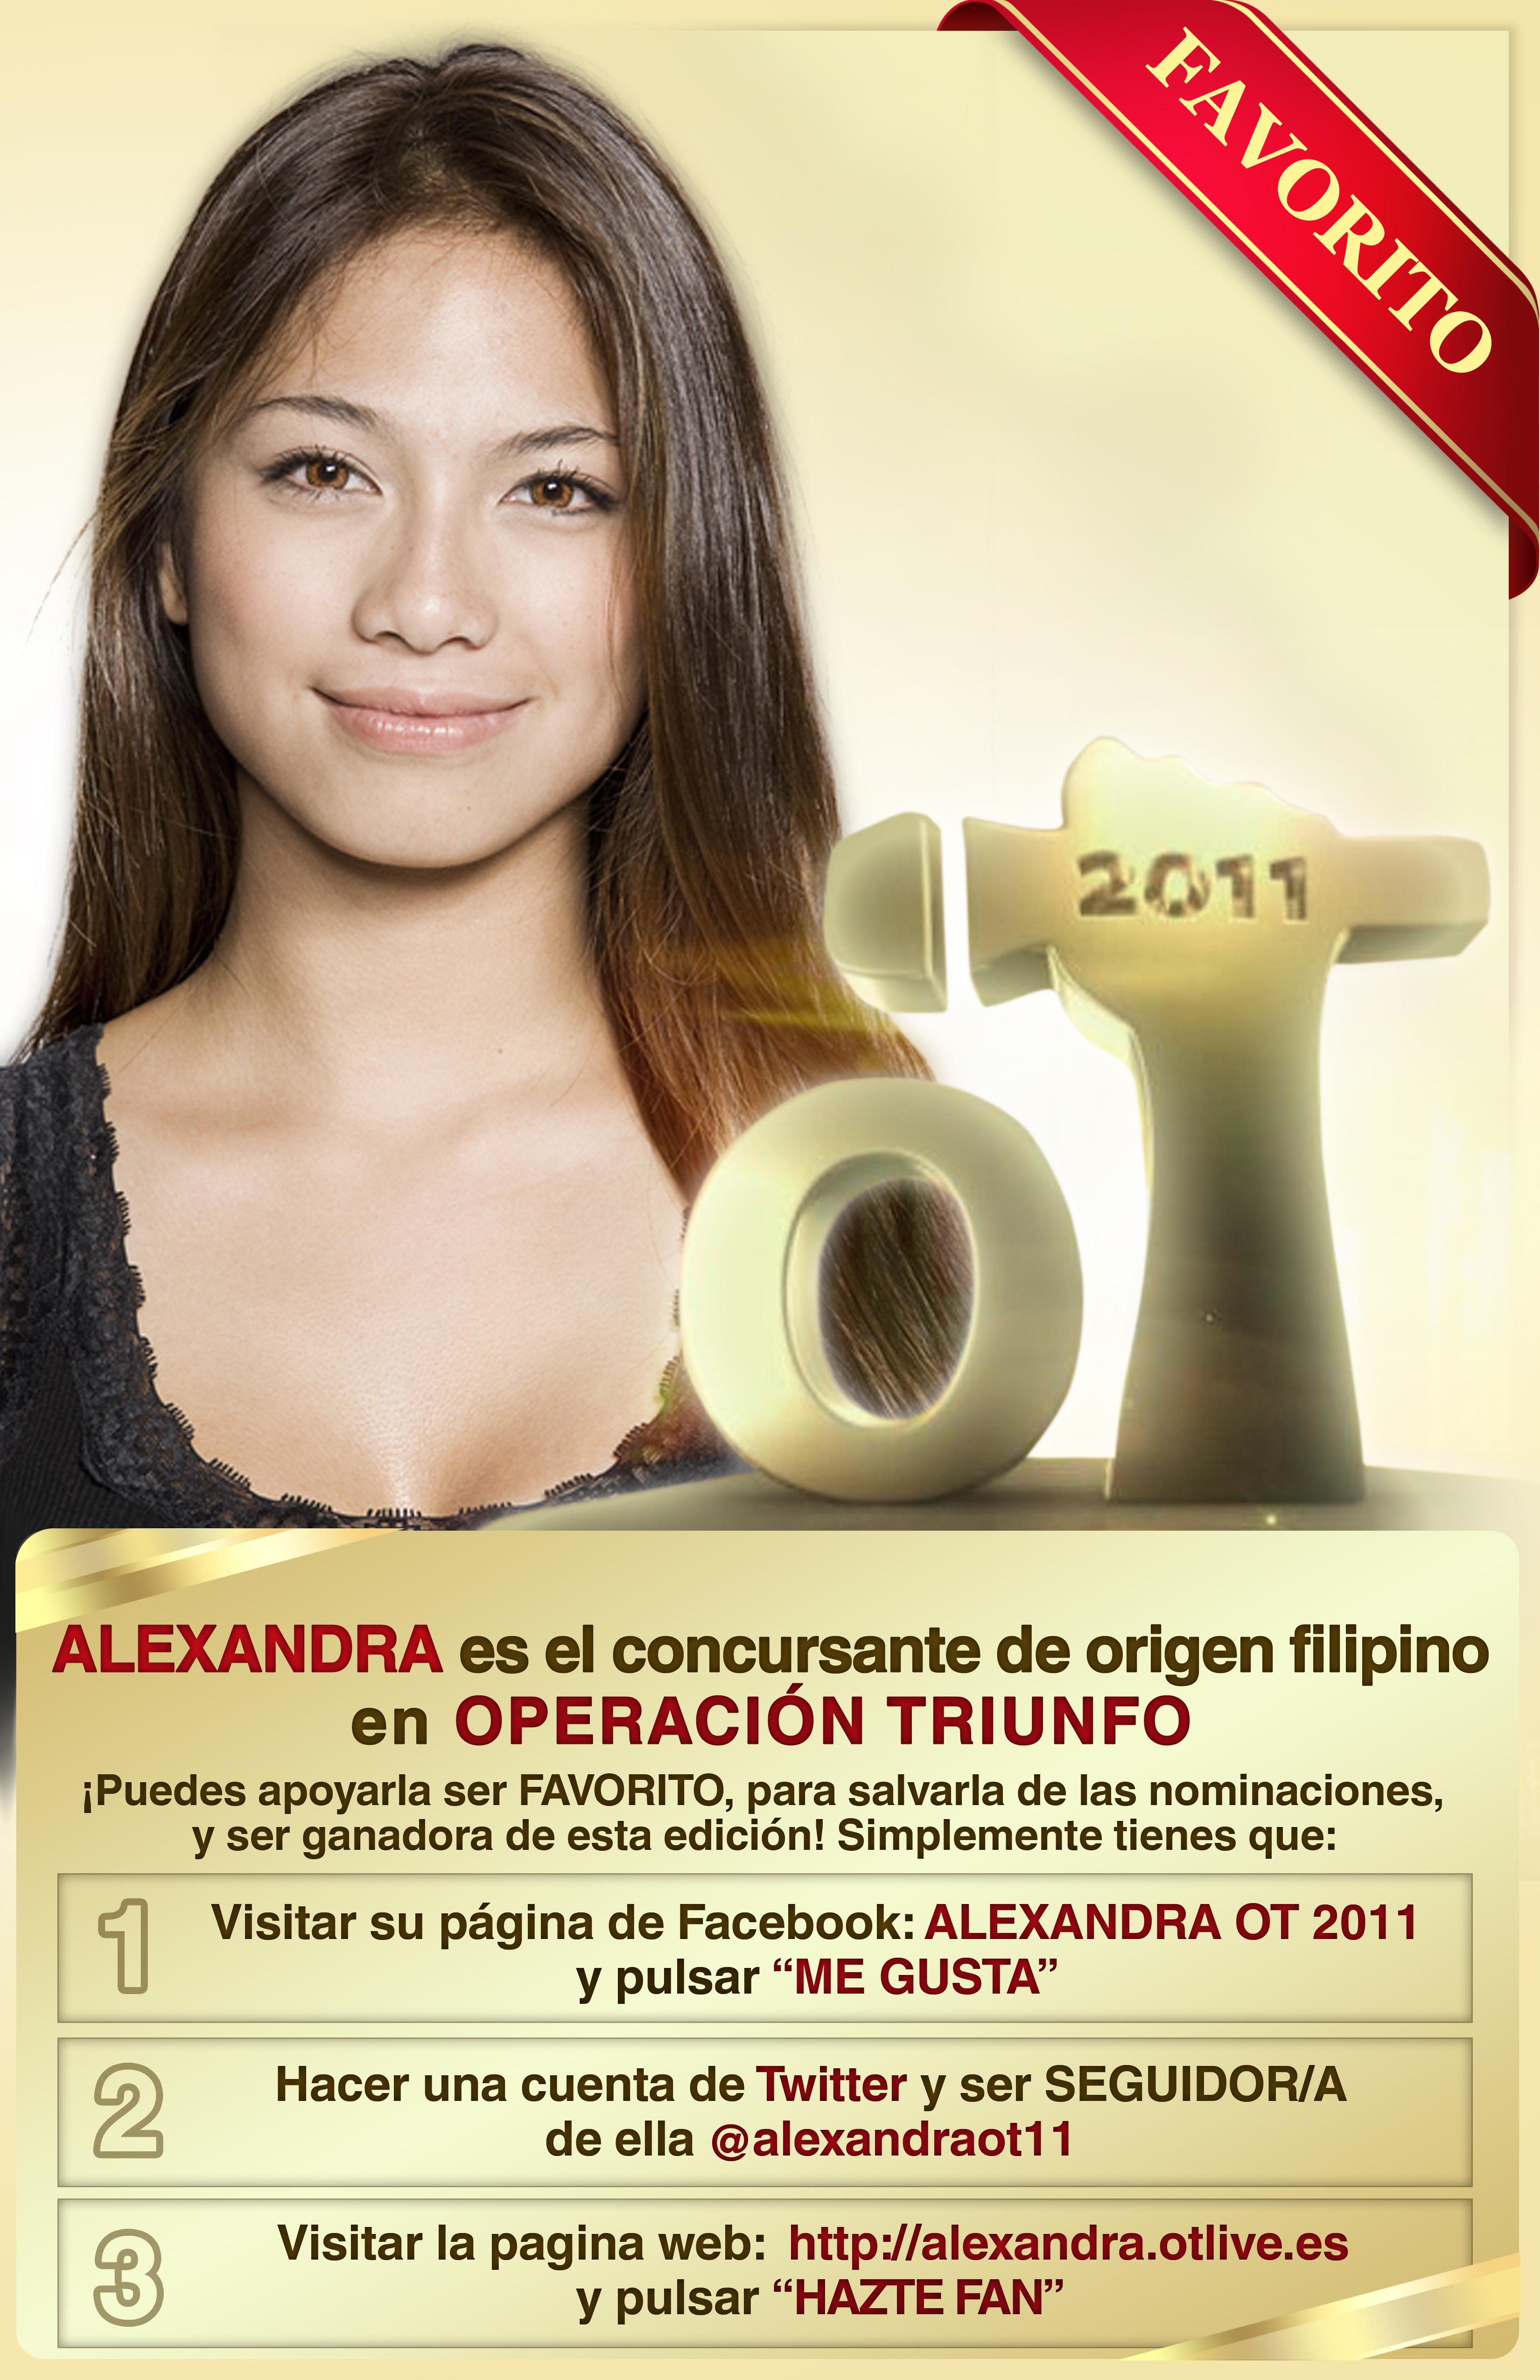 Alexandra operacion triunfo filipina dating